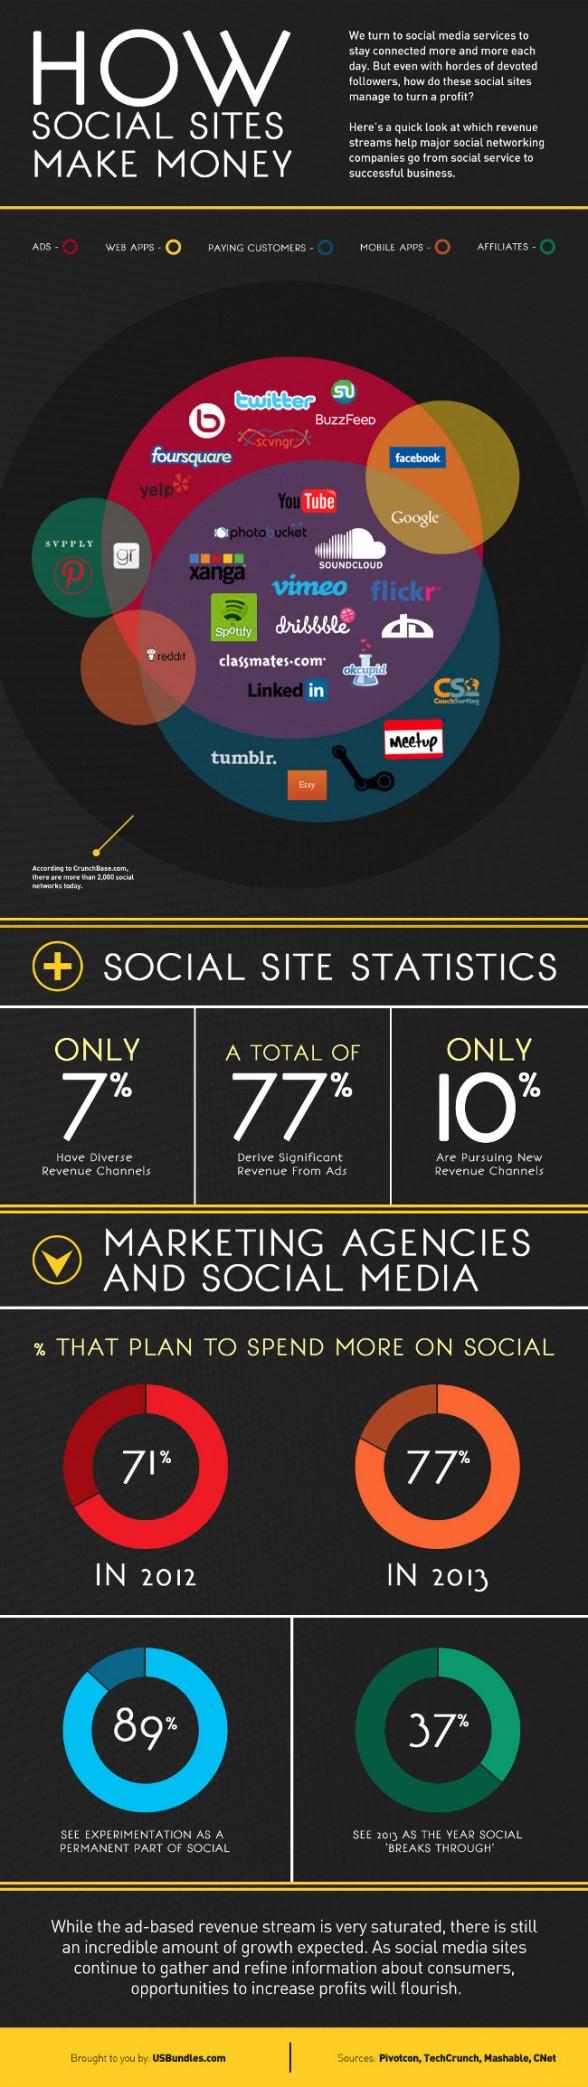 Revenus des médias sociaux